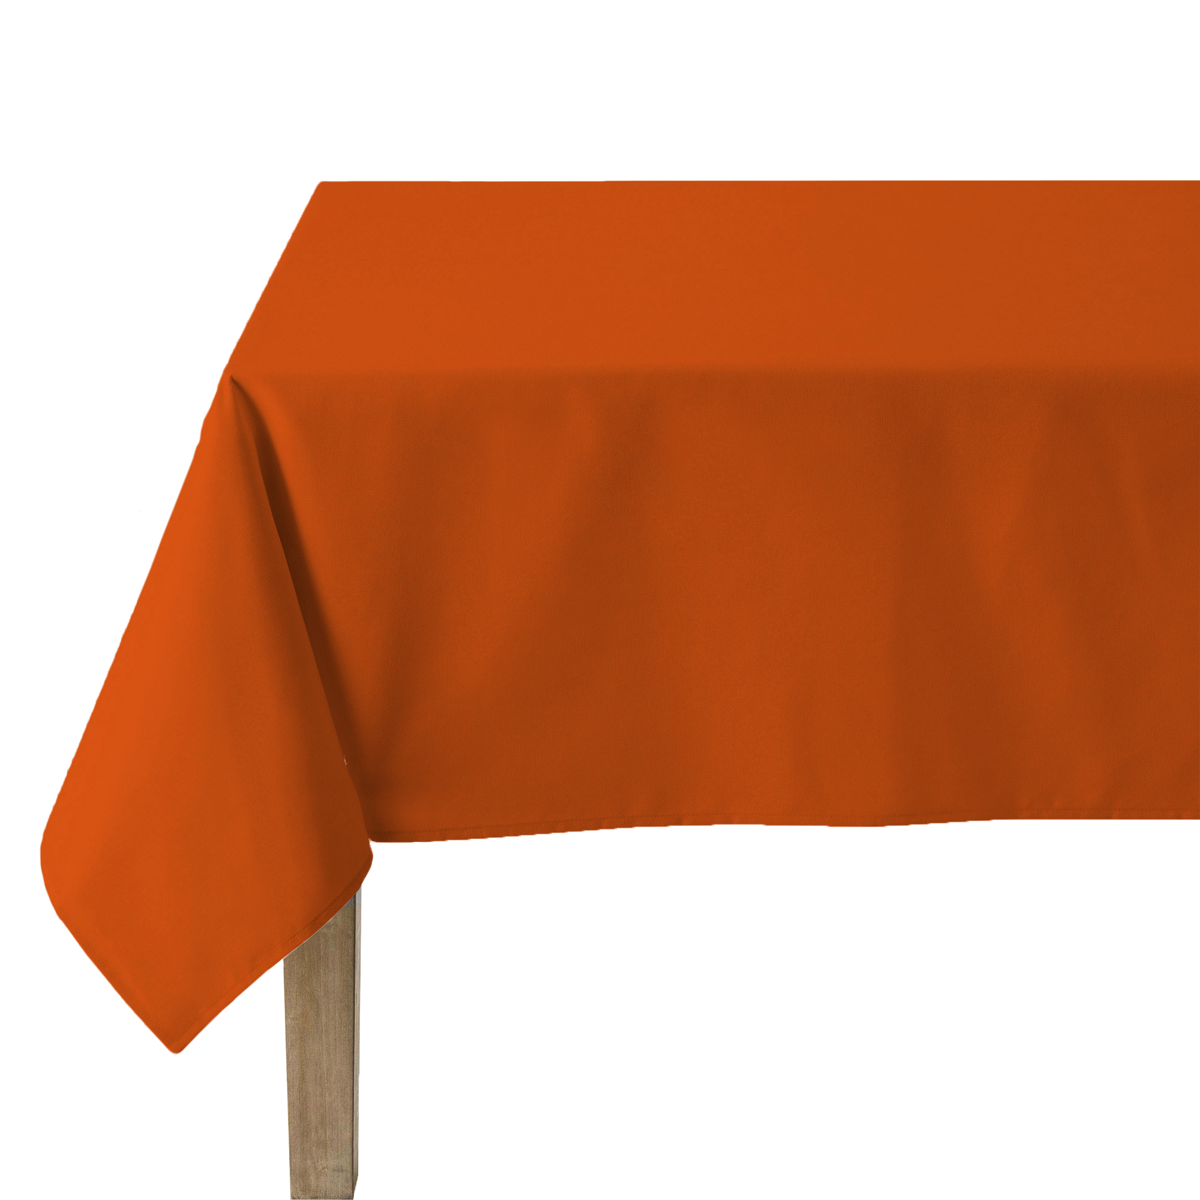 Nappe unie en polylin tangerine 160 x 240